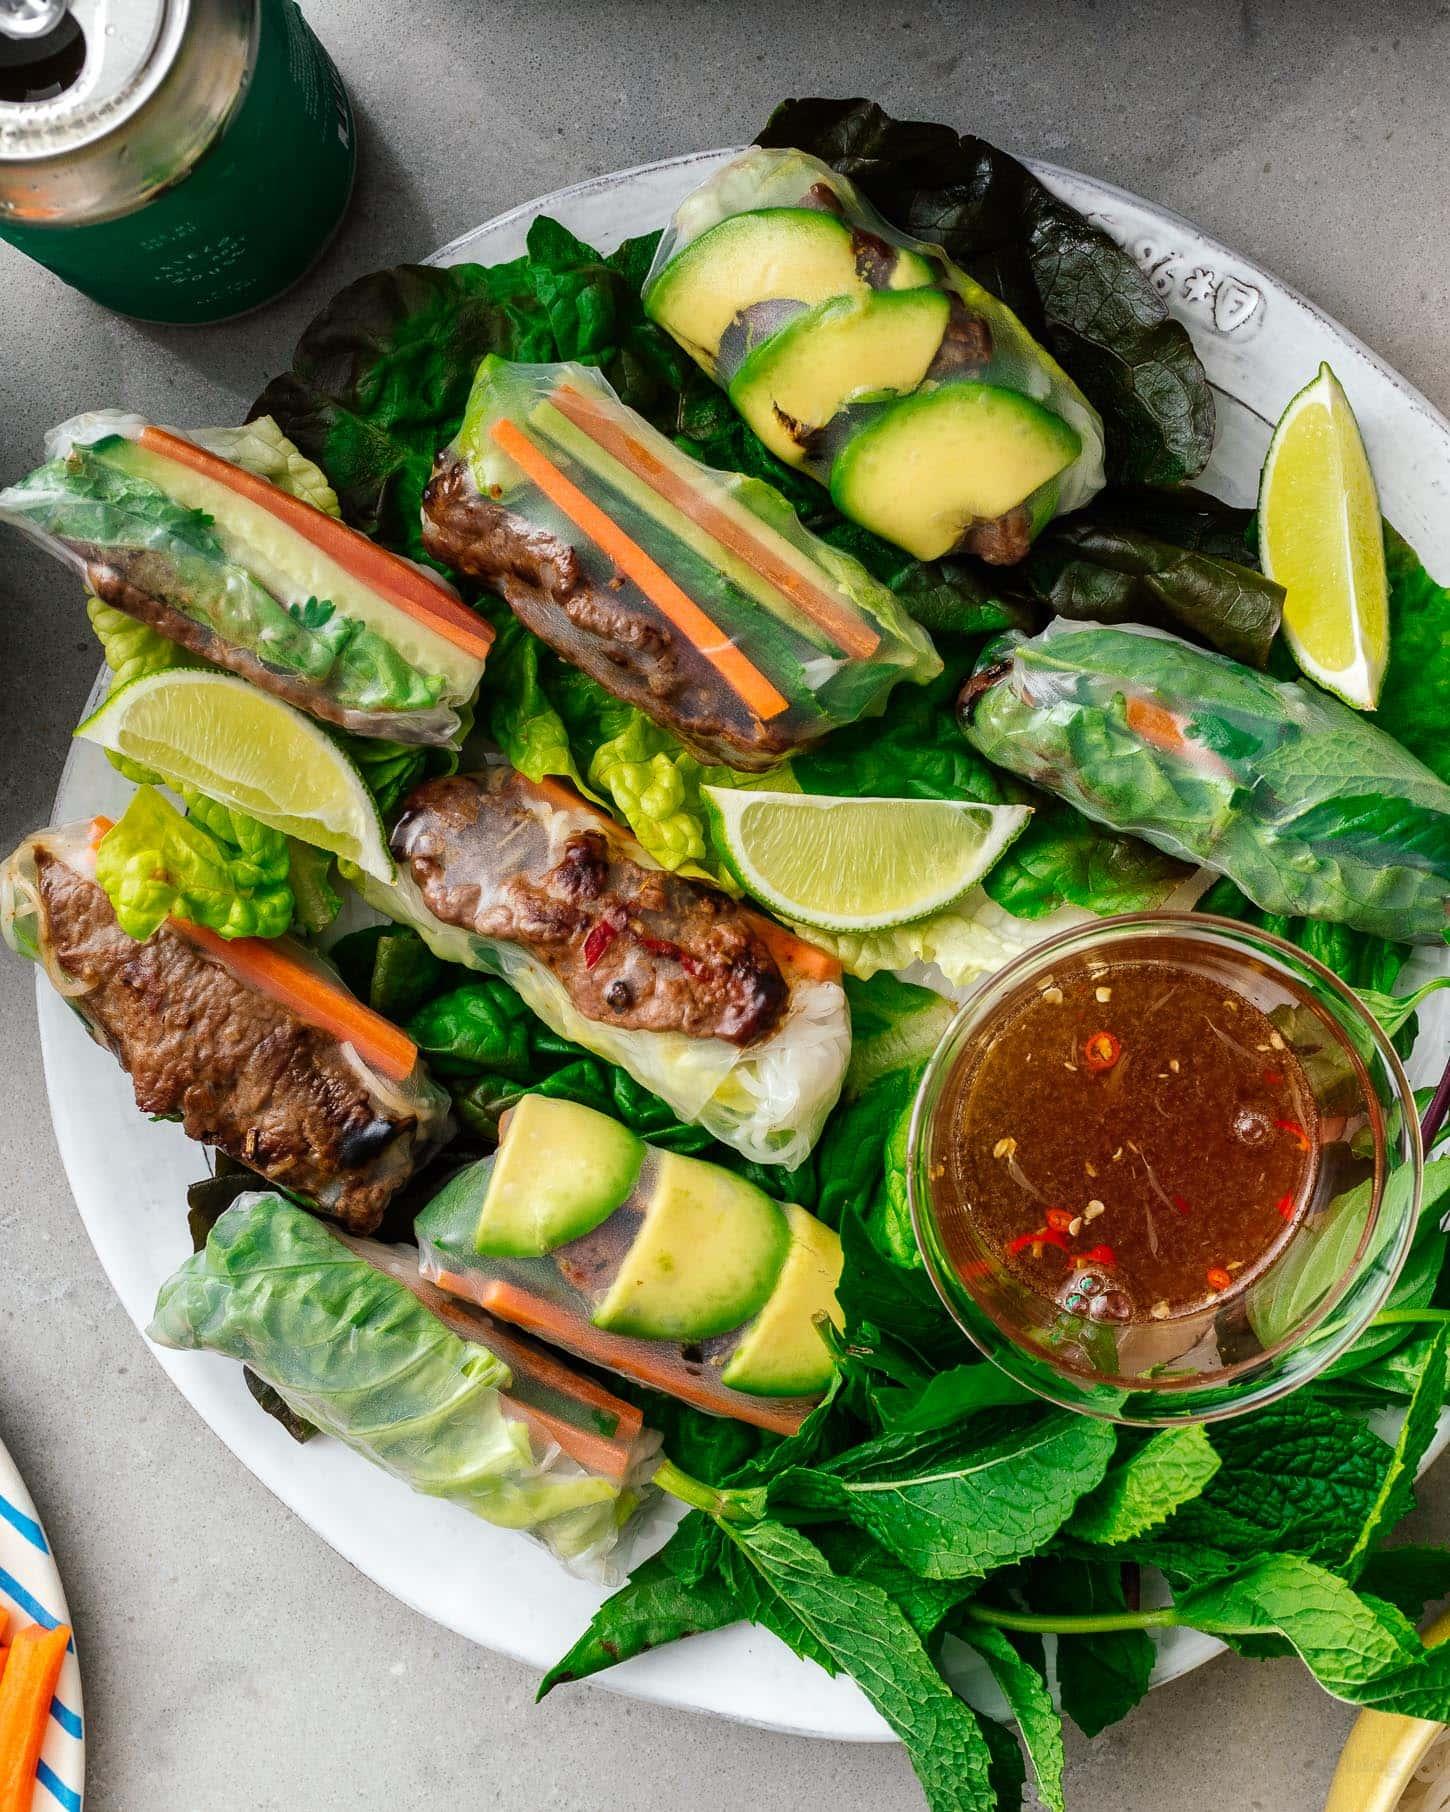 petits pains à salade |  www.iamafoodblog.com